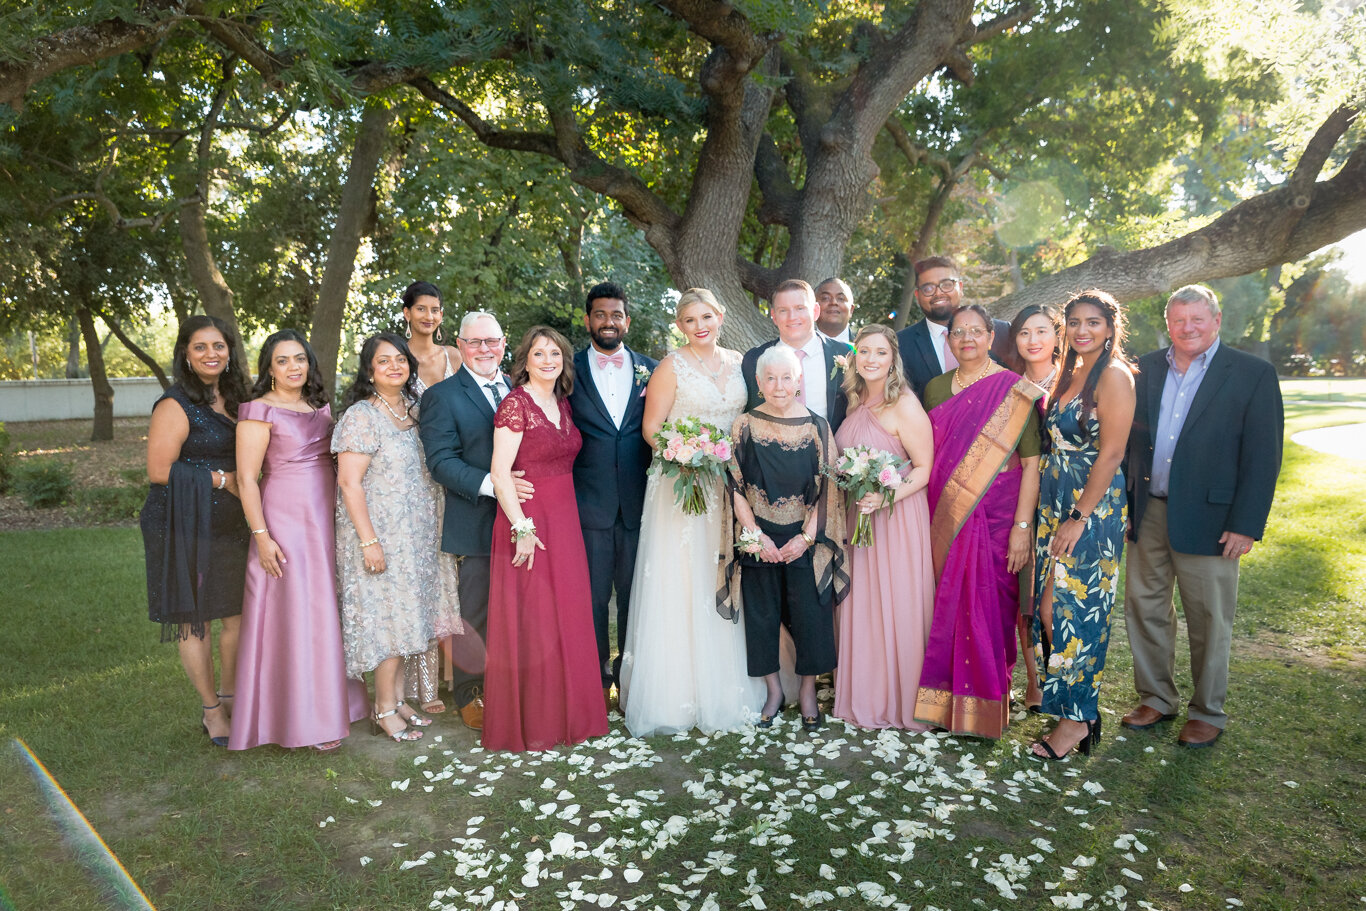 2019.08.24_Emily-Ashir-Wedding-at-the-Maples-6009.jpg